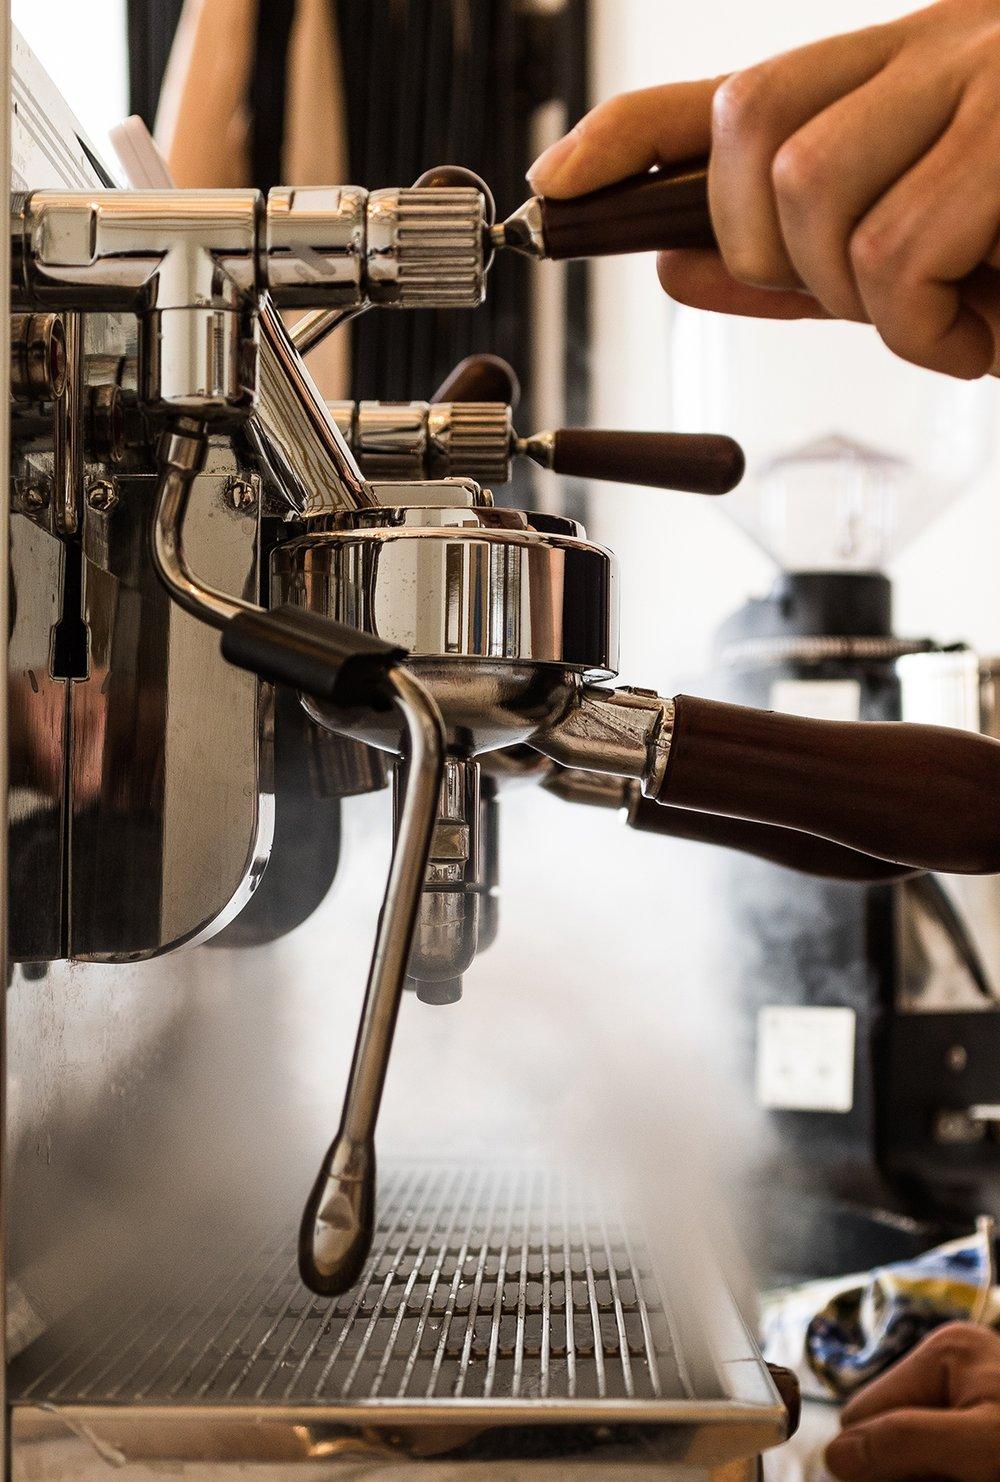 JMP_Bailey Coffee_Apr1 2017-4759_V2.jpg